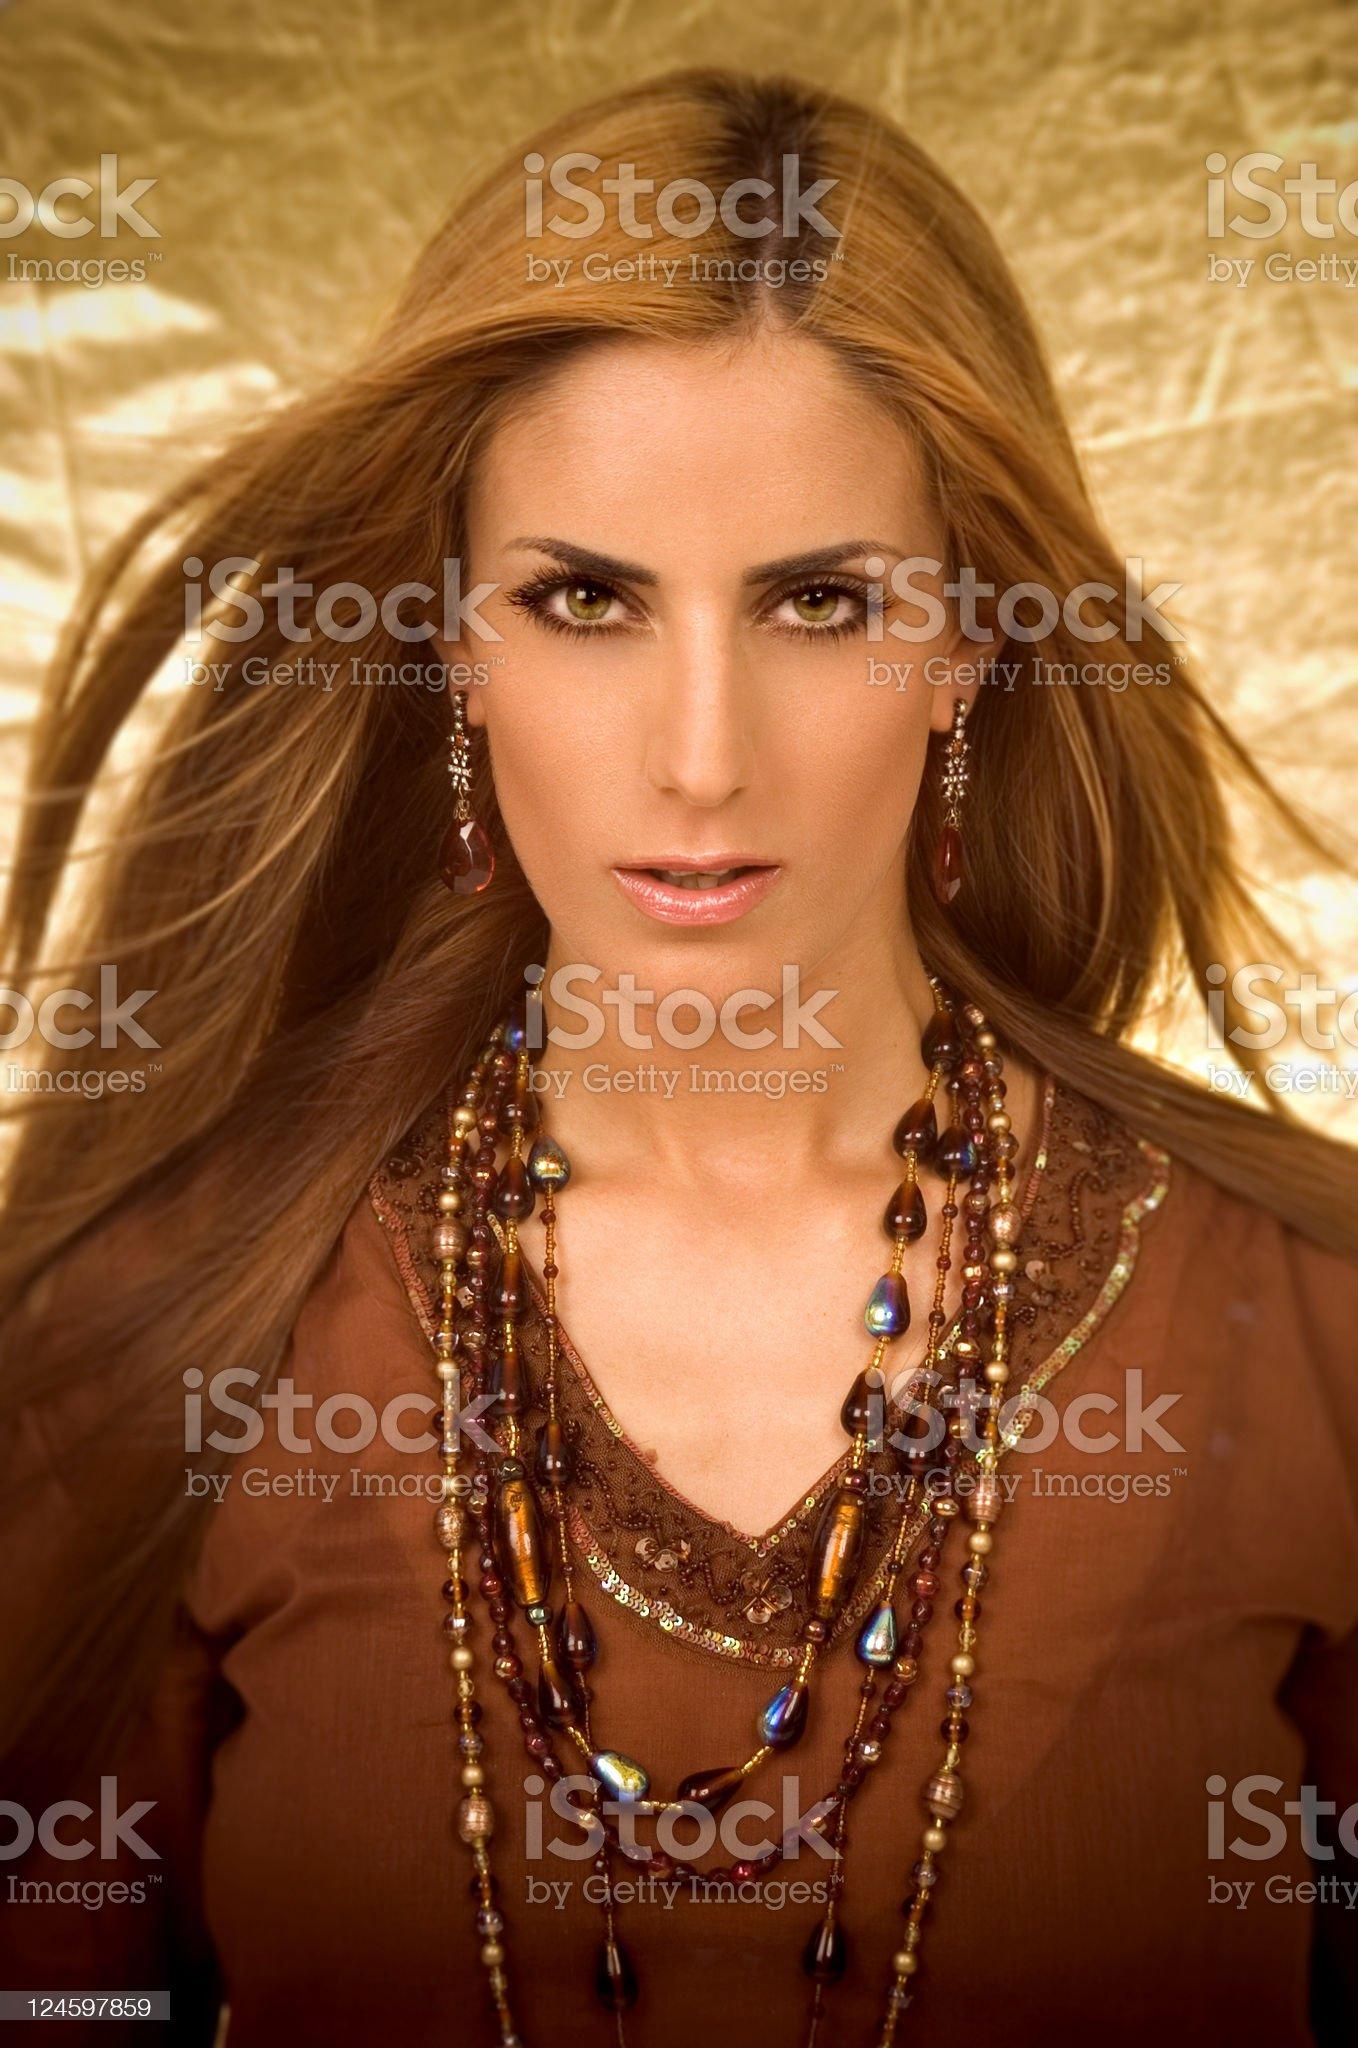 Oriental Beauty royalty-free stock photo